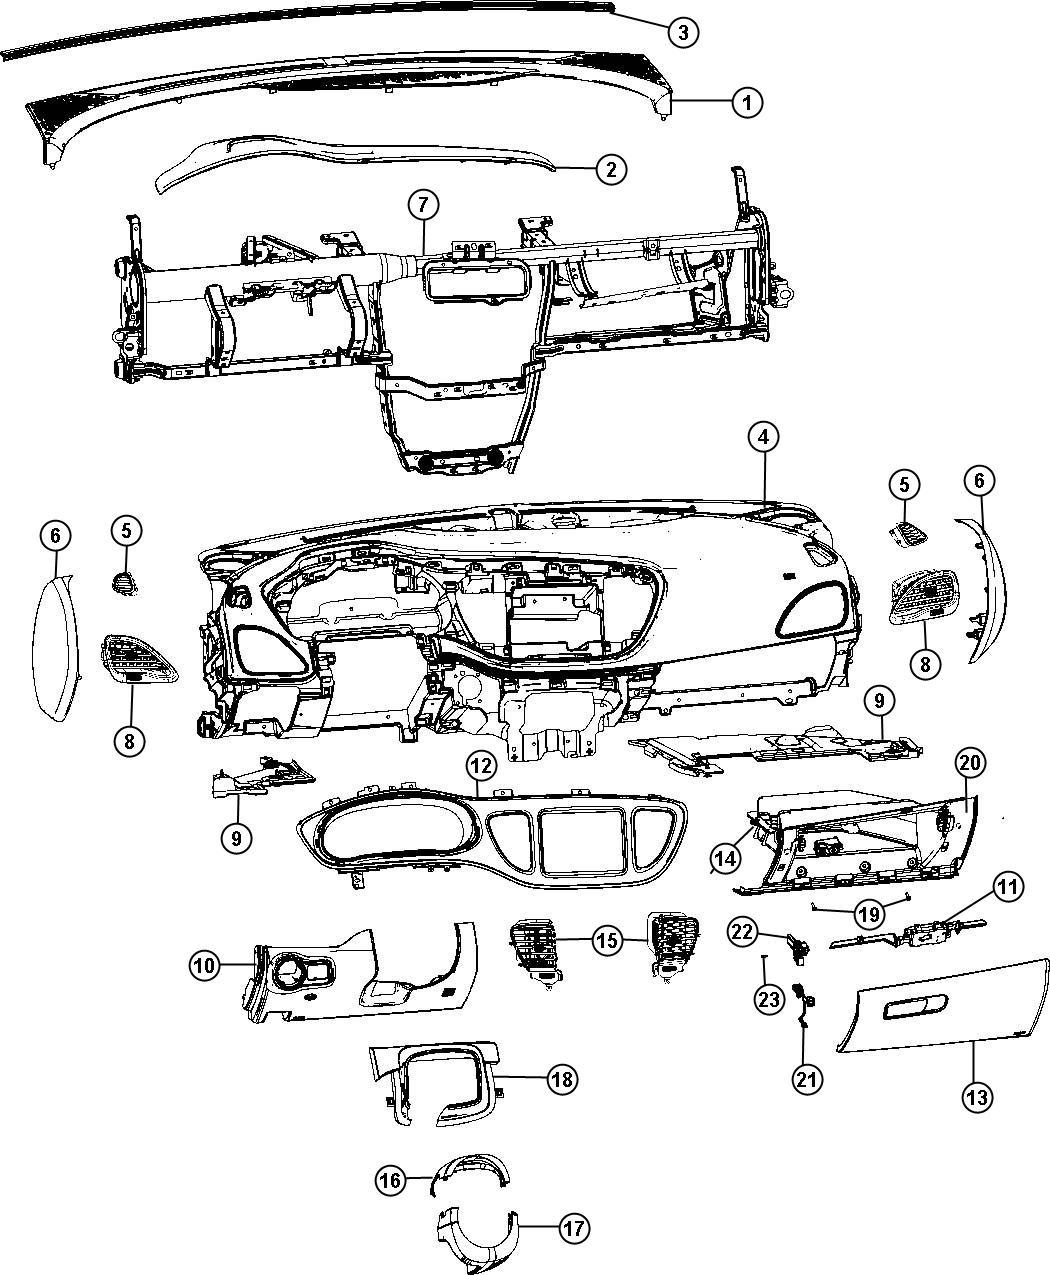 2013 Dodge Dart Panel. Instrument panel closeout. Left